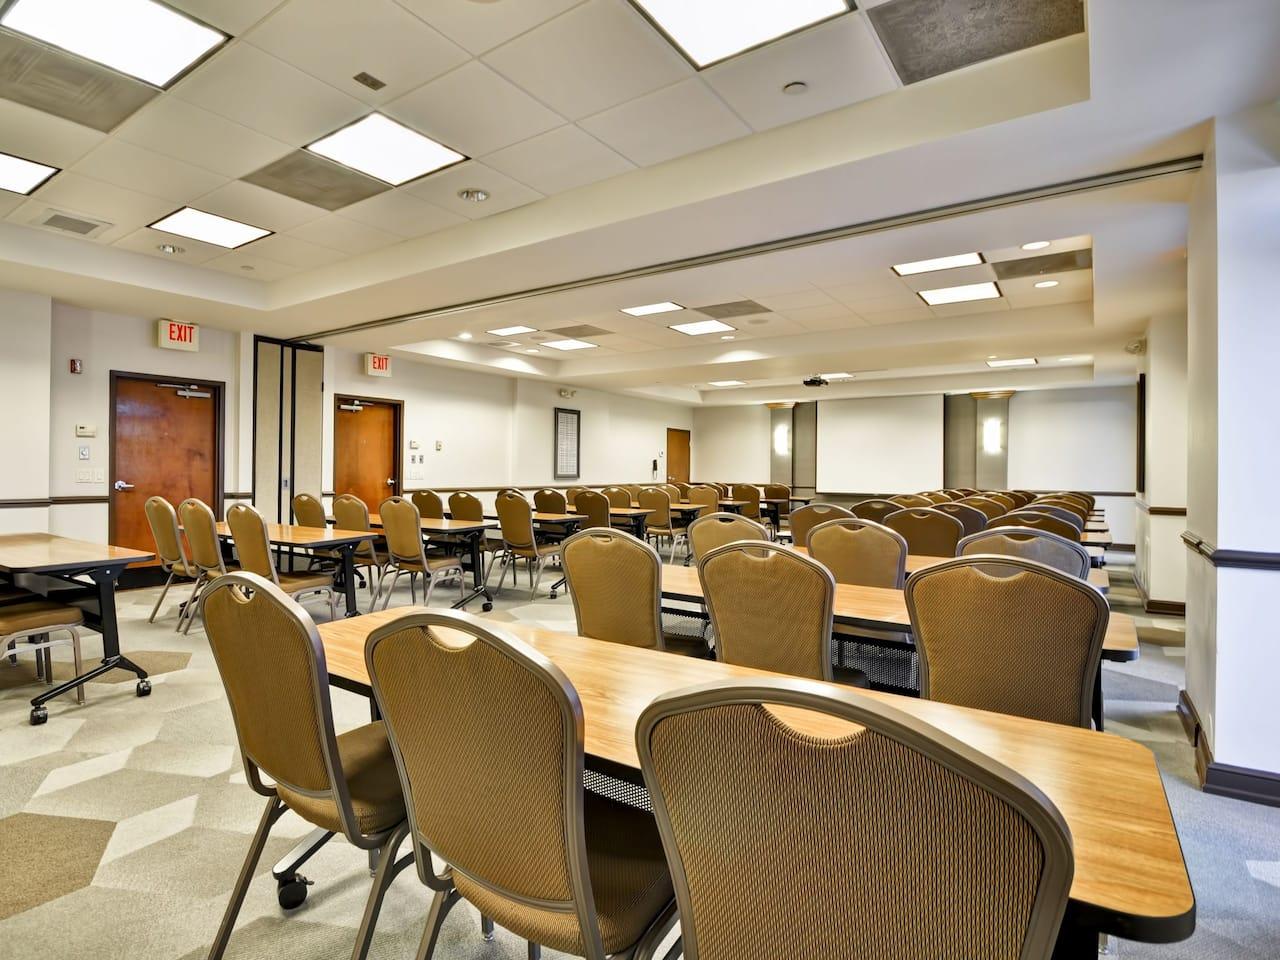 Meeting Room Hyatt Place Minneapolis Airport South